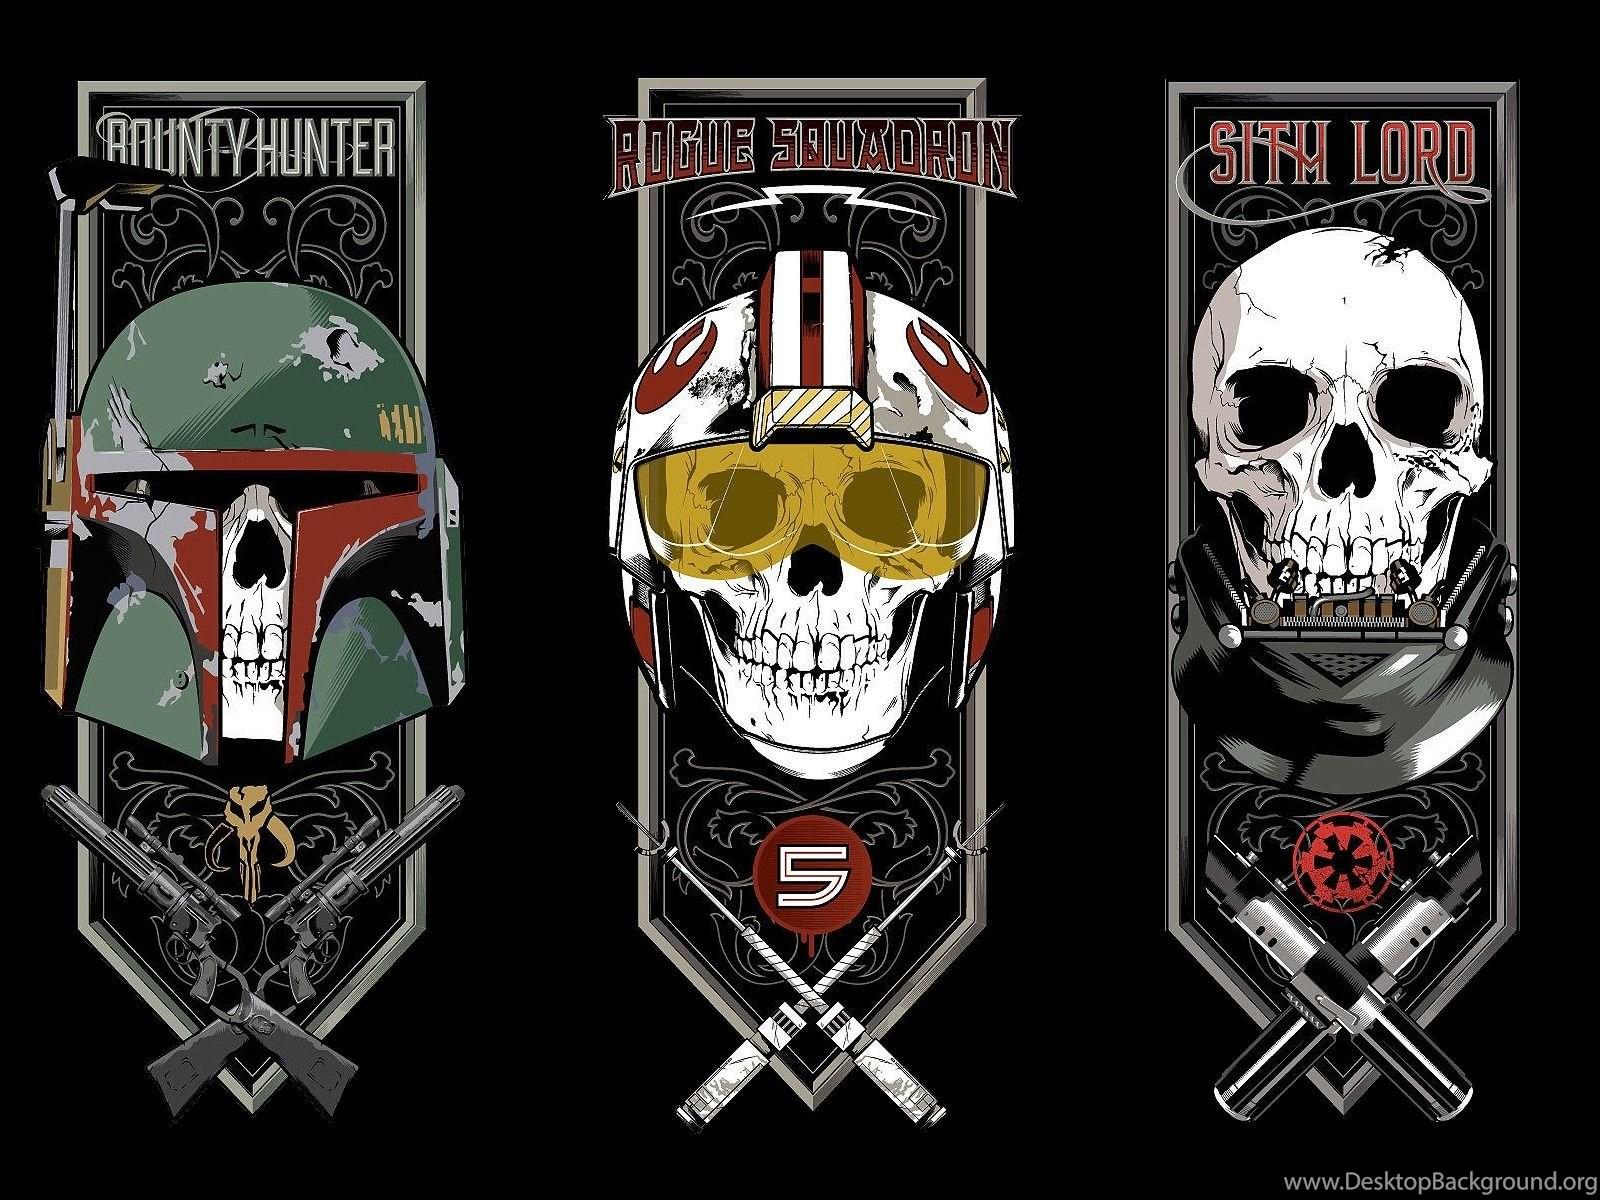 Star Wars Sith Rebel Alliance Wallpapers Hd Desktop Background